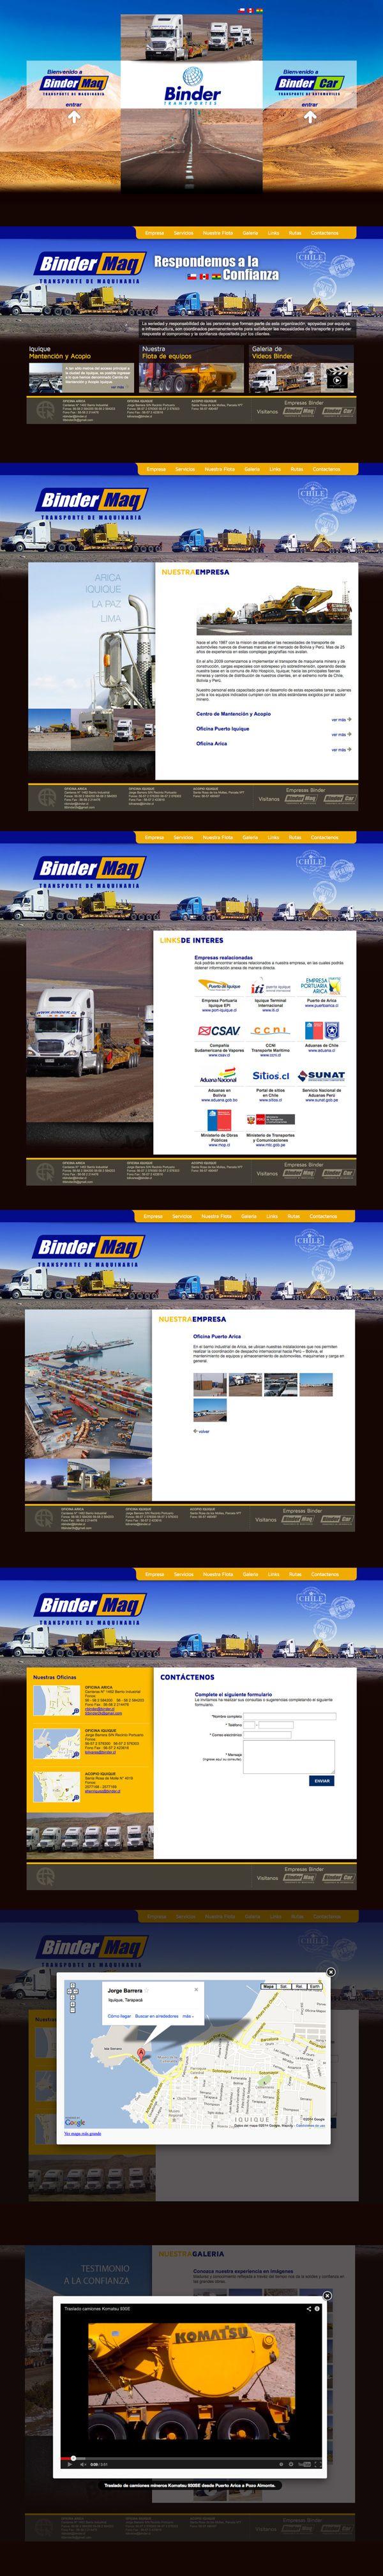 Transportes Binder by Walter Rojas Gacitúa, via Behance